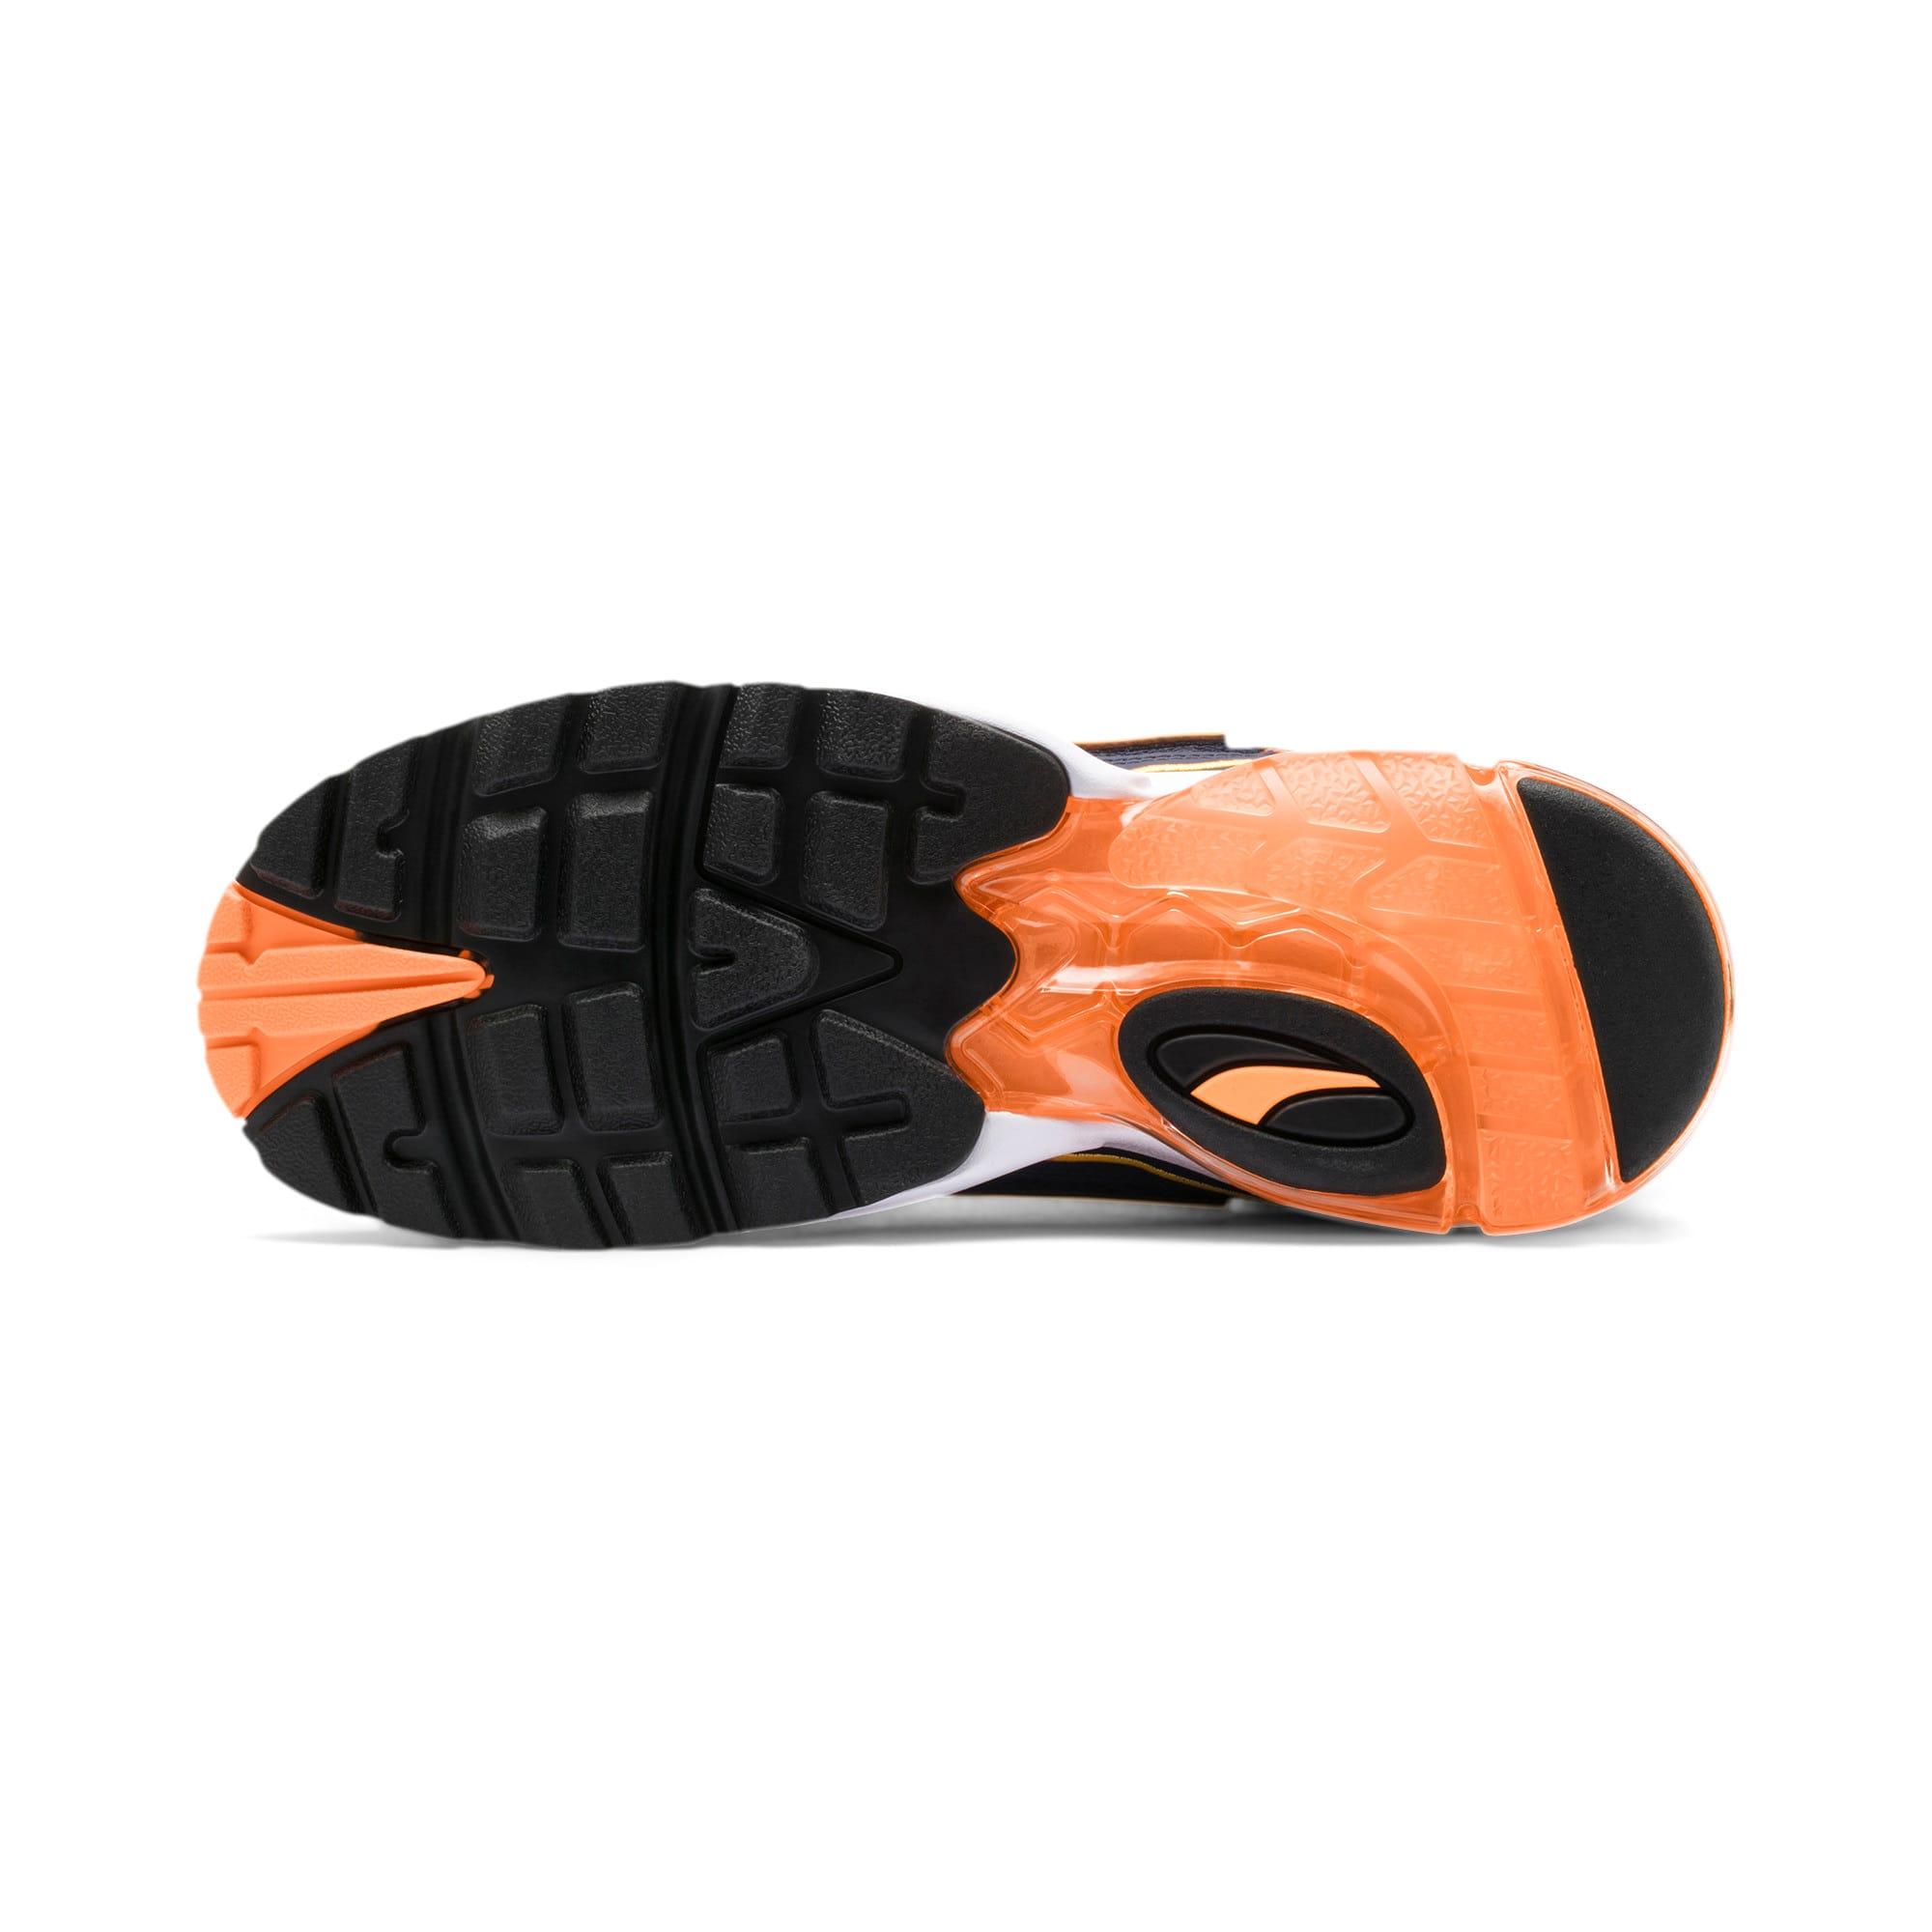 Thumbnail 5 of CELL Ultra OG Pack Sneakers, Peacoat-Jaffa Orange, medium